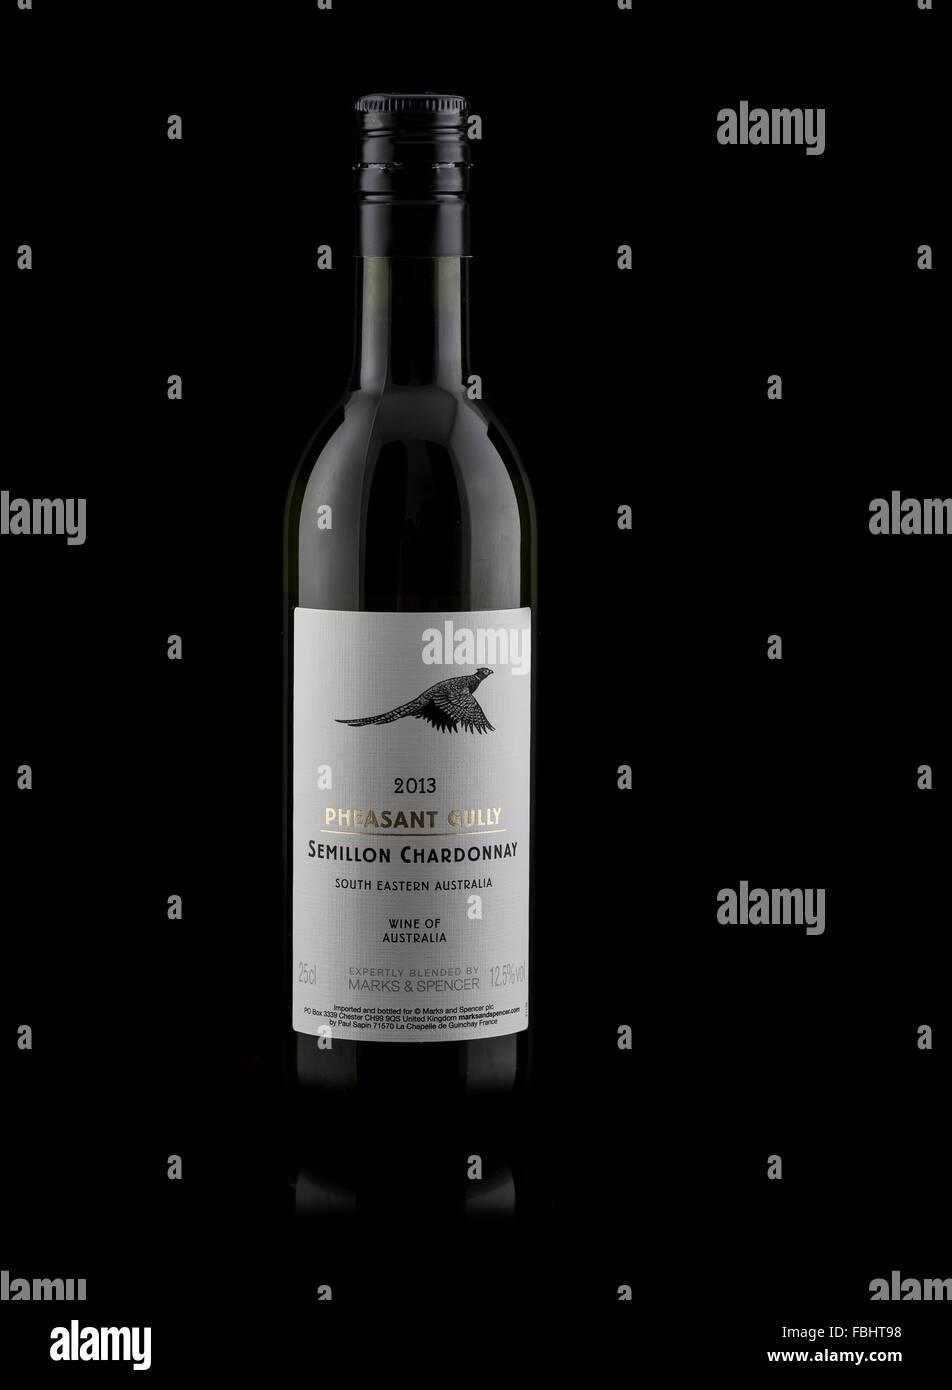 Bottle of Pheasant Gully Semillon Chardonnay Wine from Australia on a Black background - Stock Image